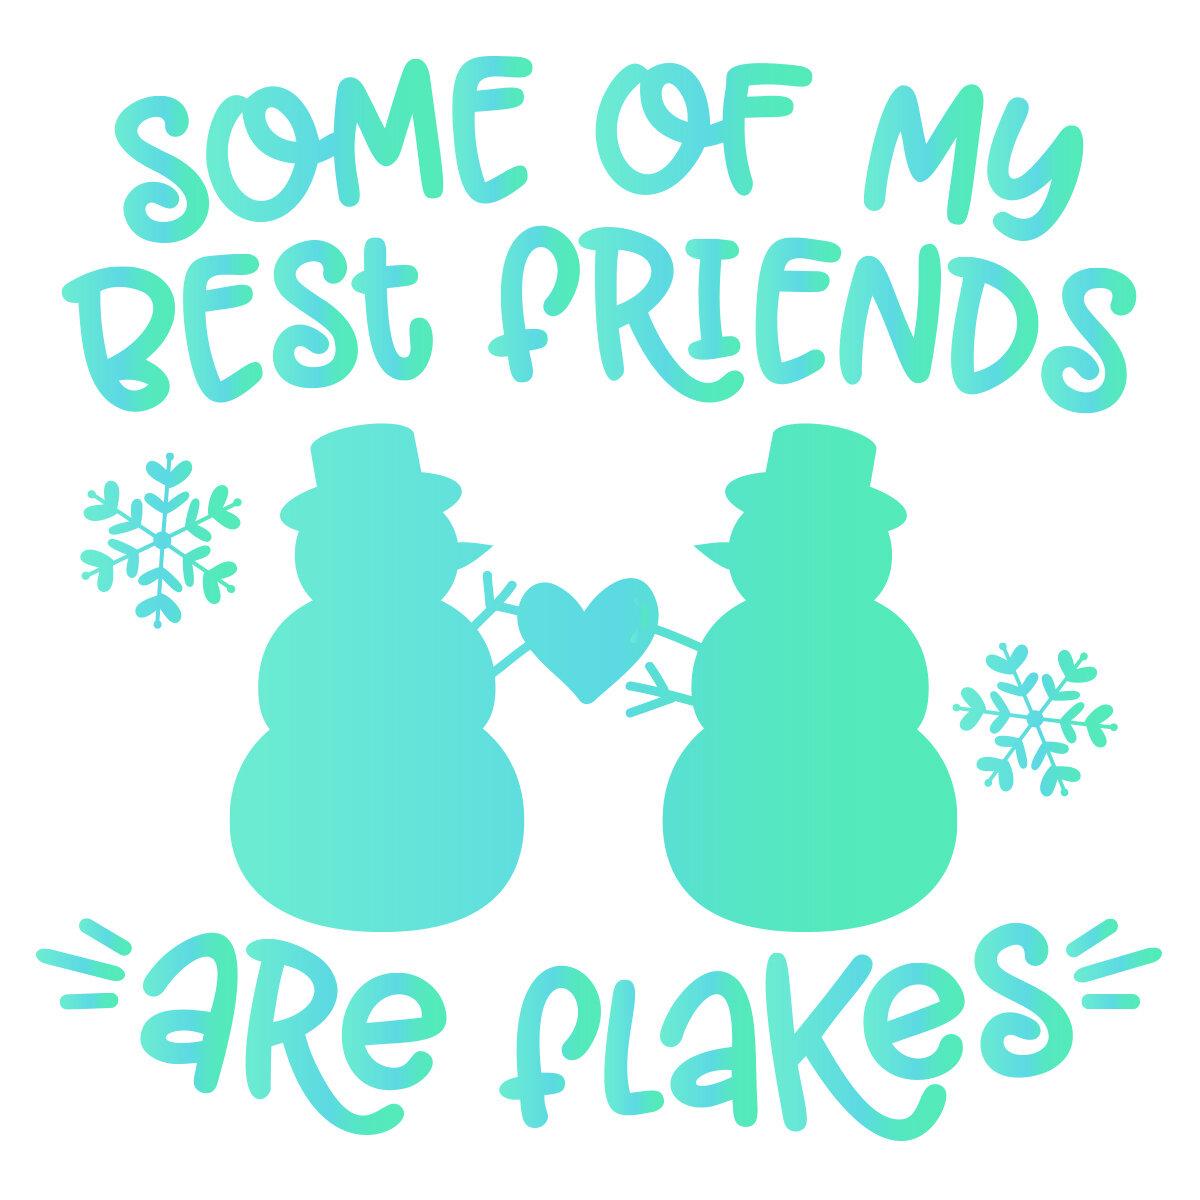 Jld Best Friends Are Flakes Jamieandjenn Com